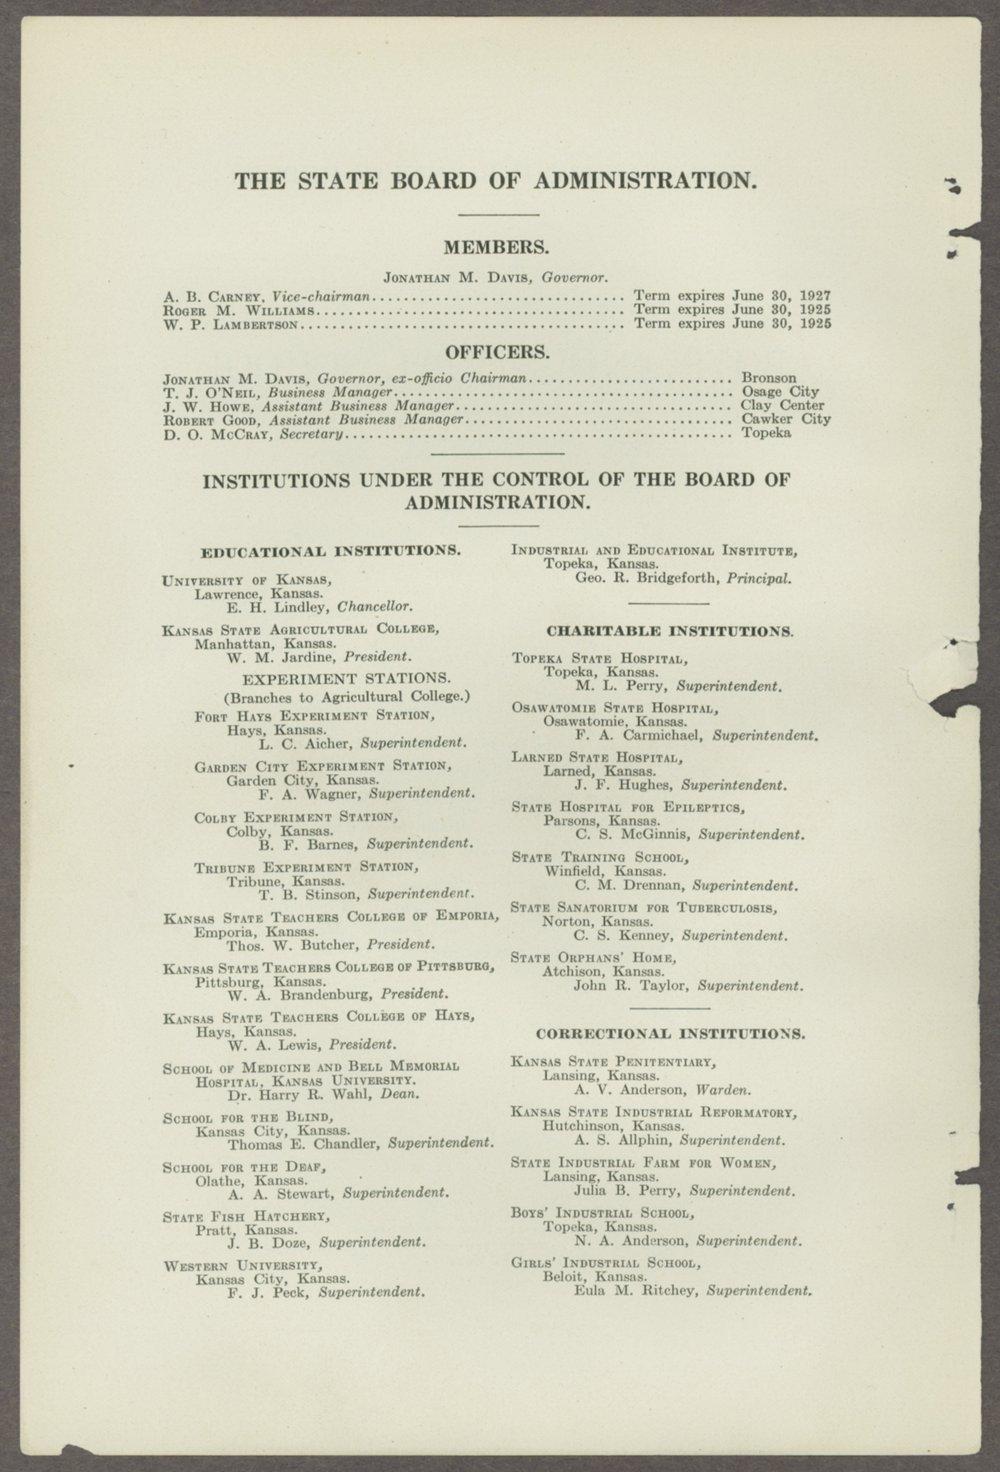 Biennial report of the Boys Industrial School, 1924 - 2